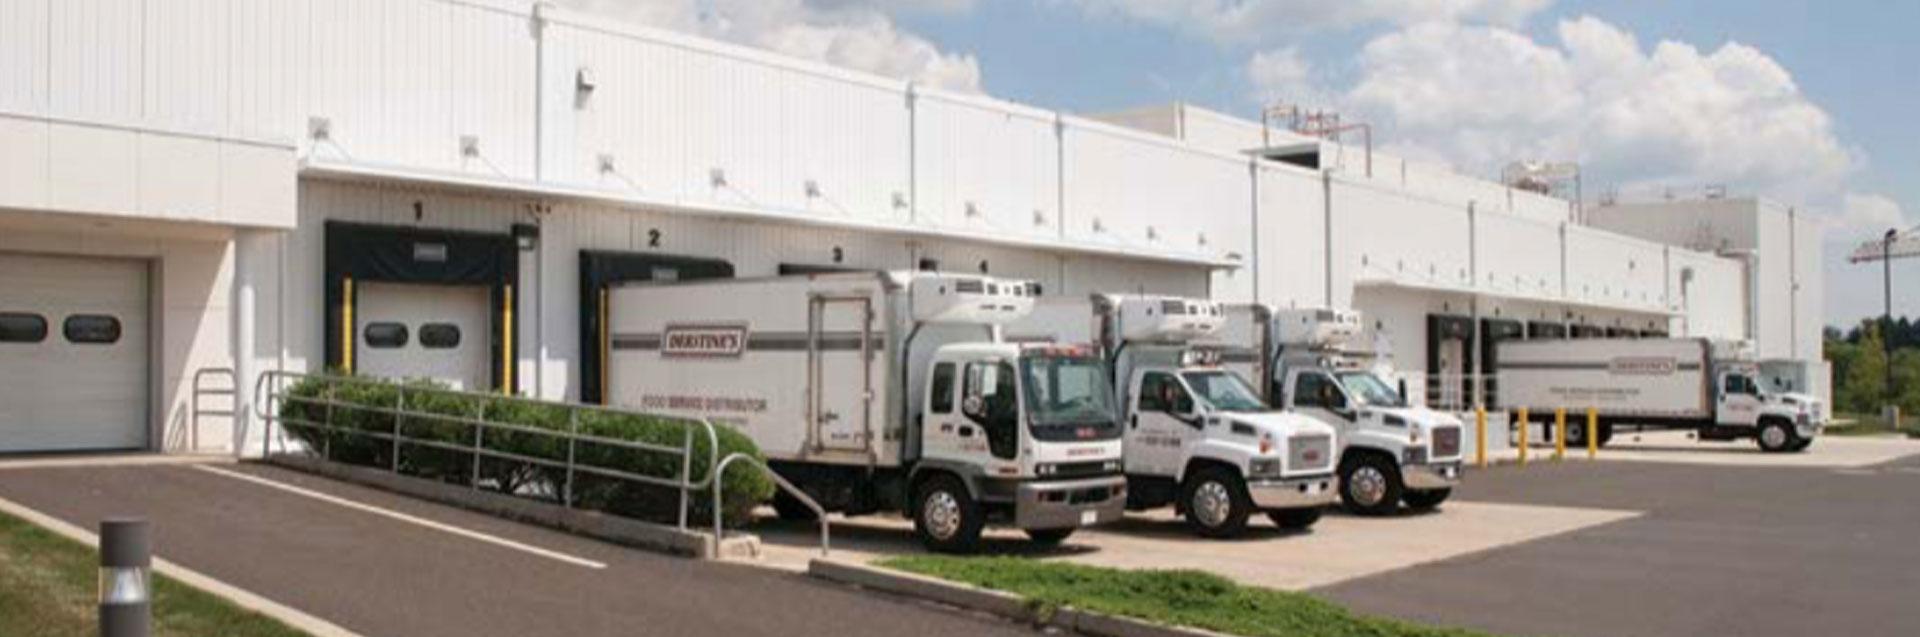 Trucks outside the Derstine's building